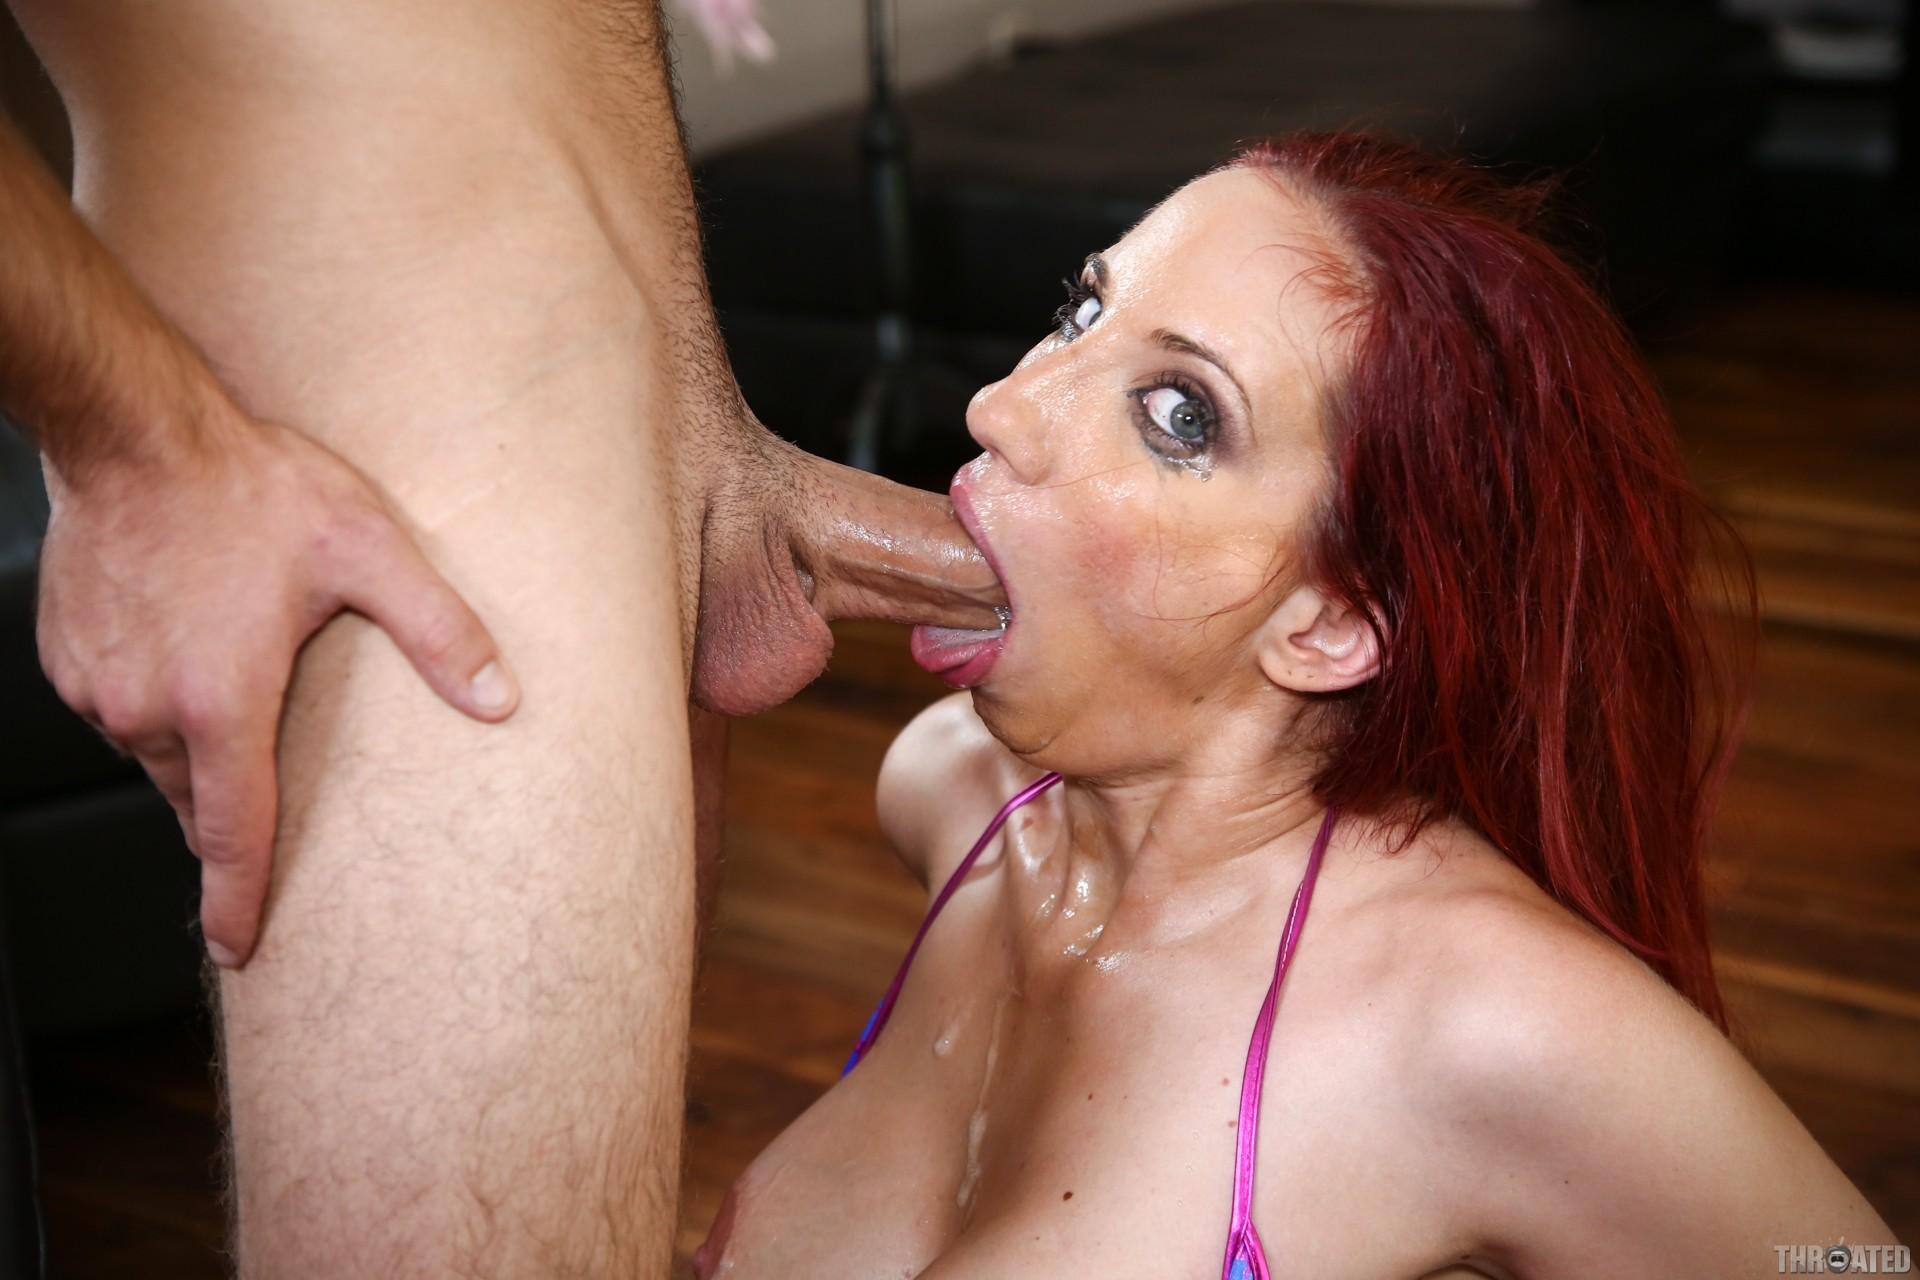 french-deep-throat-porn-sexy-ass-jiggle